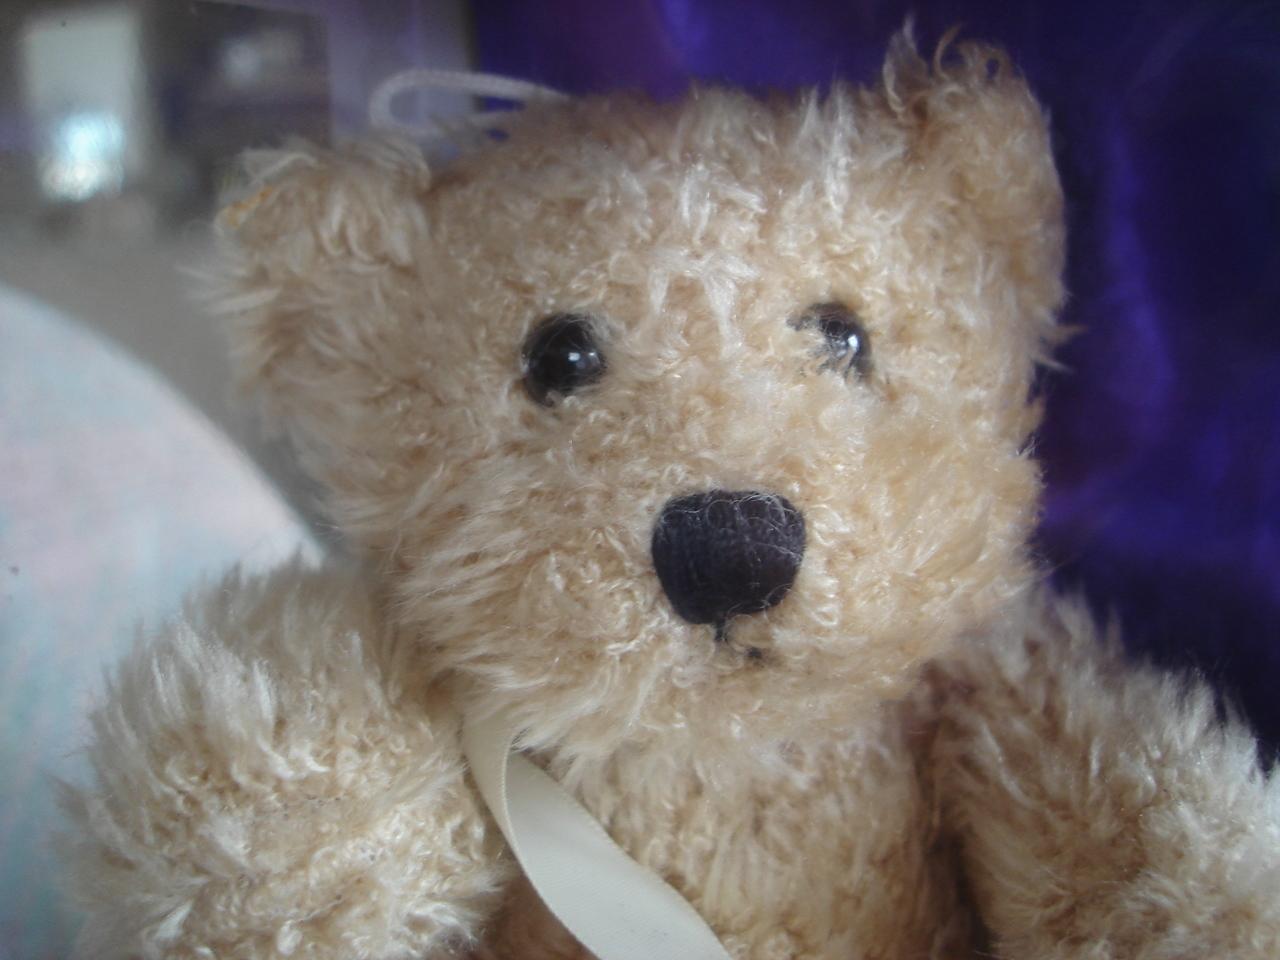 Elizabeth Taylor's 5 oz Passion EaudeToilette W Teddy Bear Doll